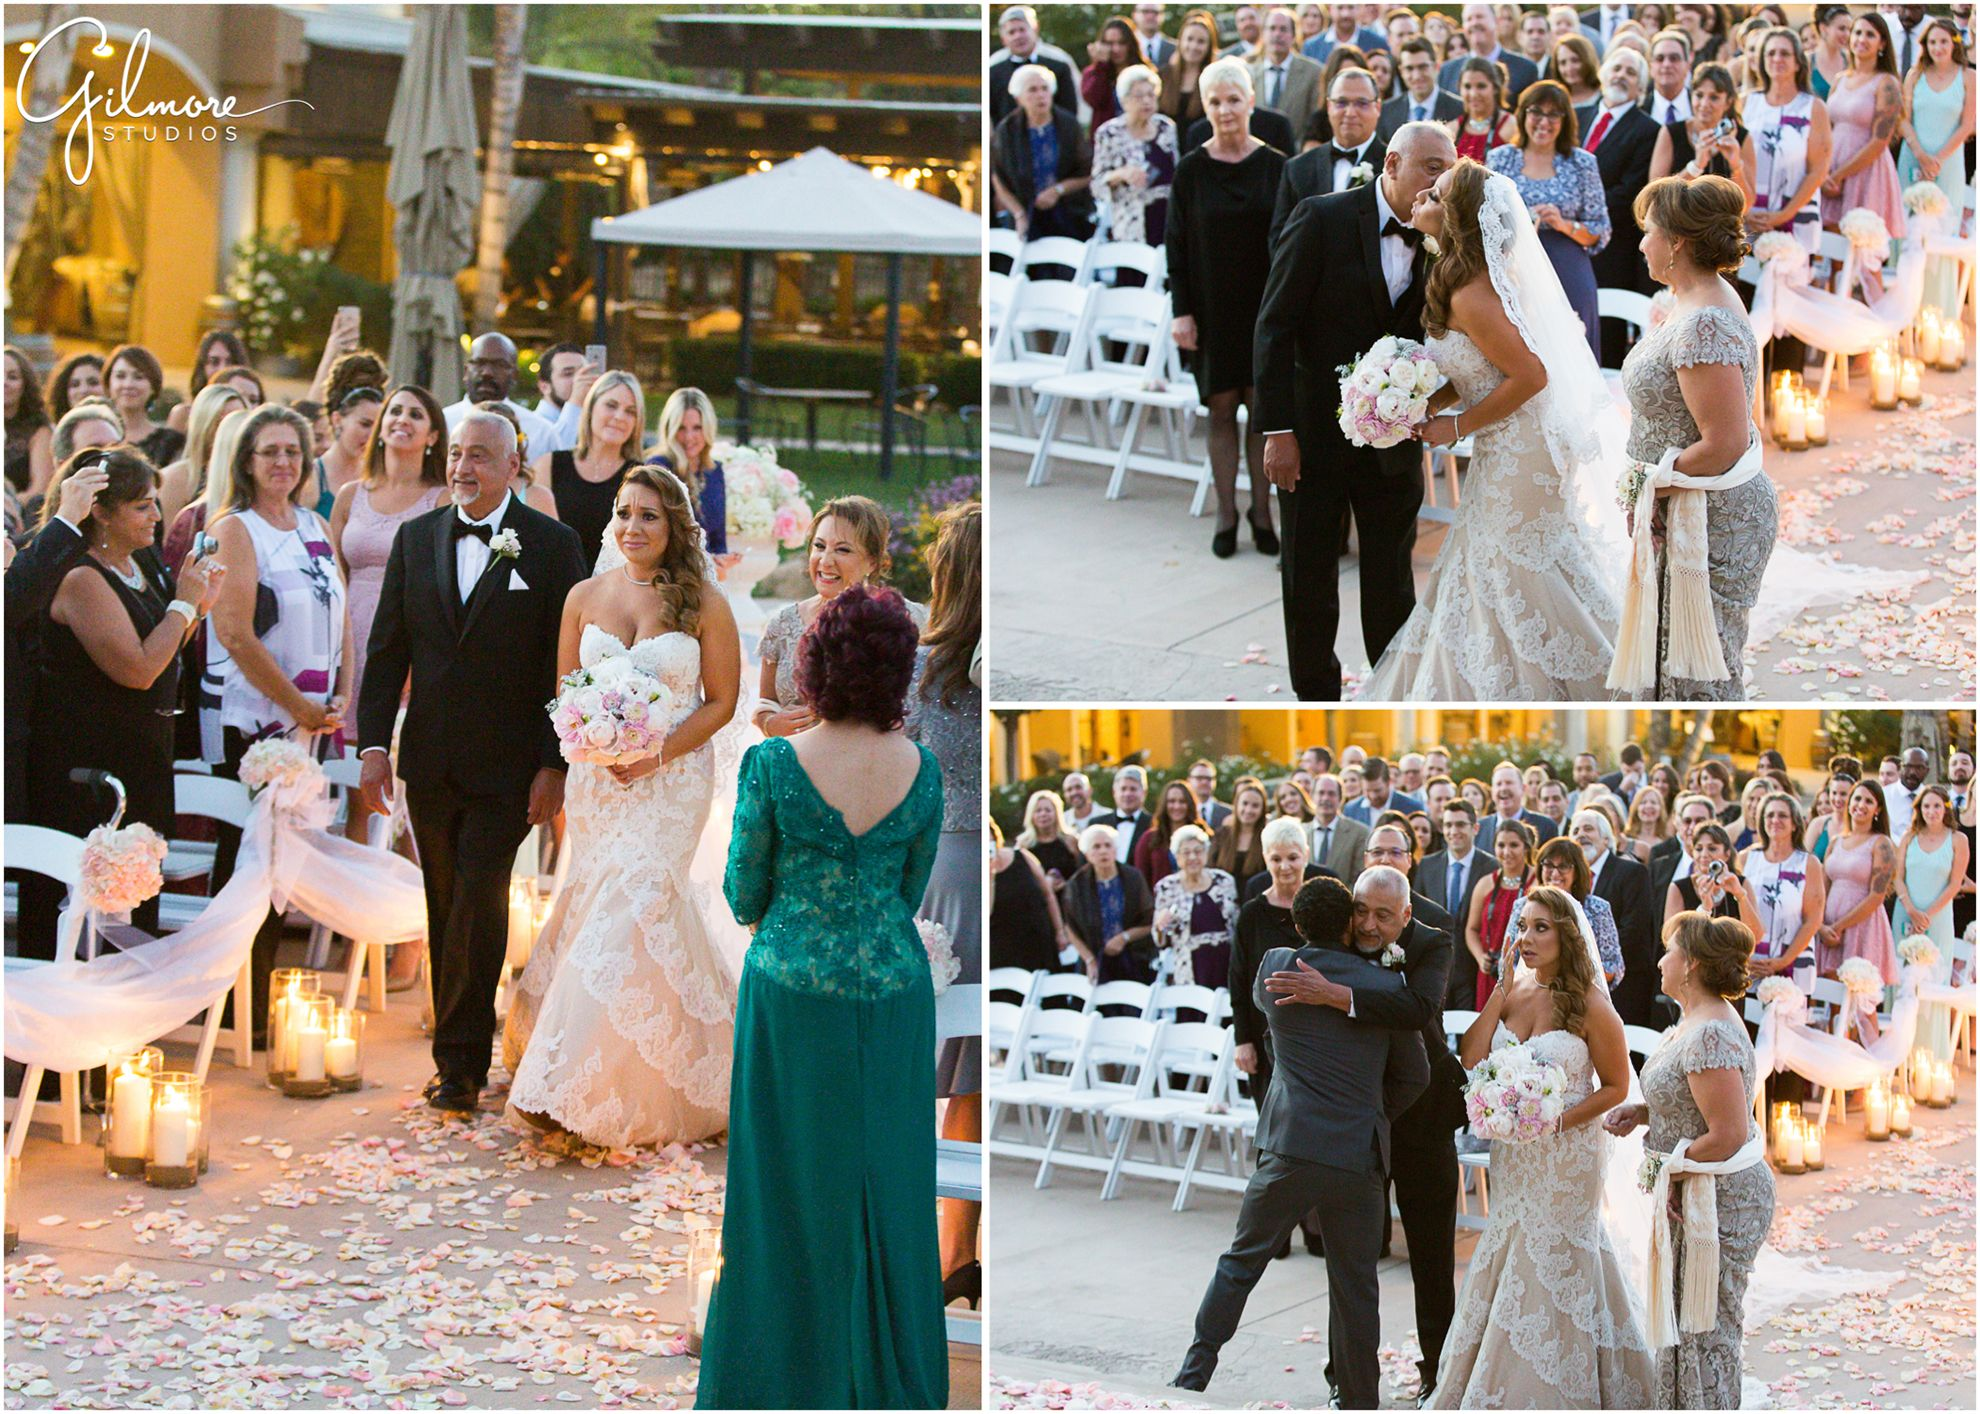 Wilson Creek Winery Wedding | Father Handing Off The Bride Wedding Ceremony Walking Down The